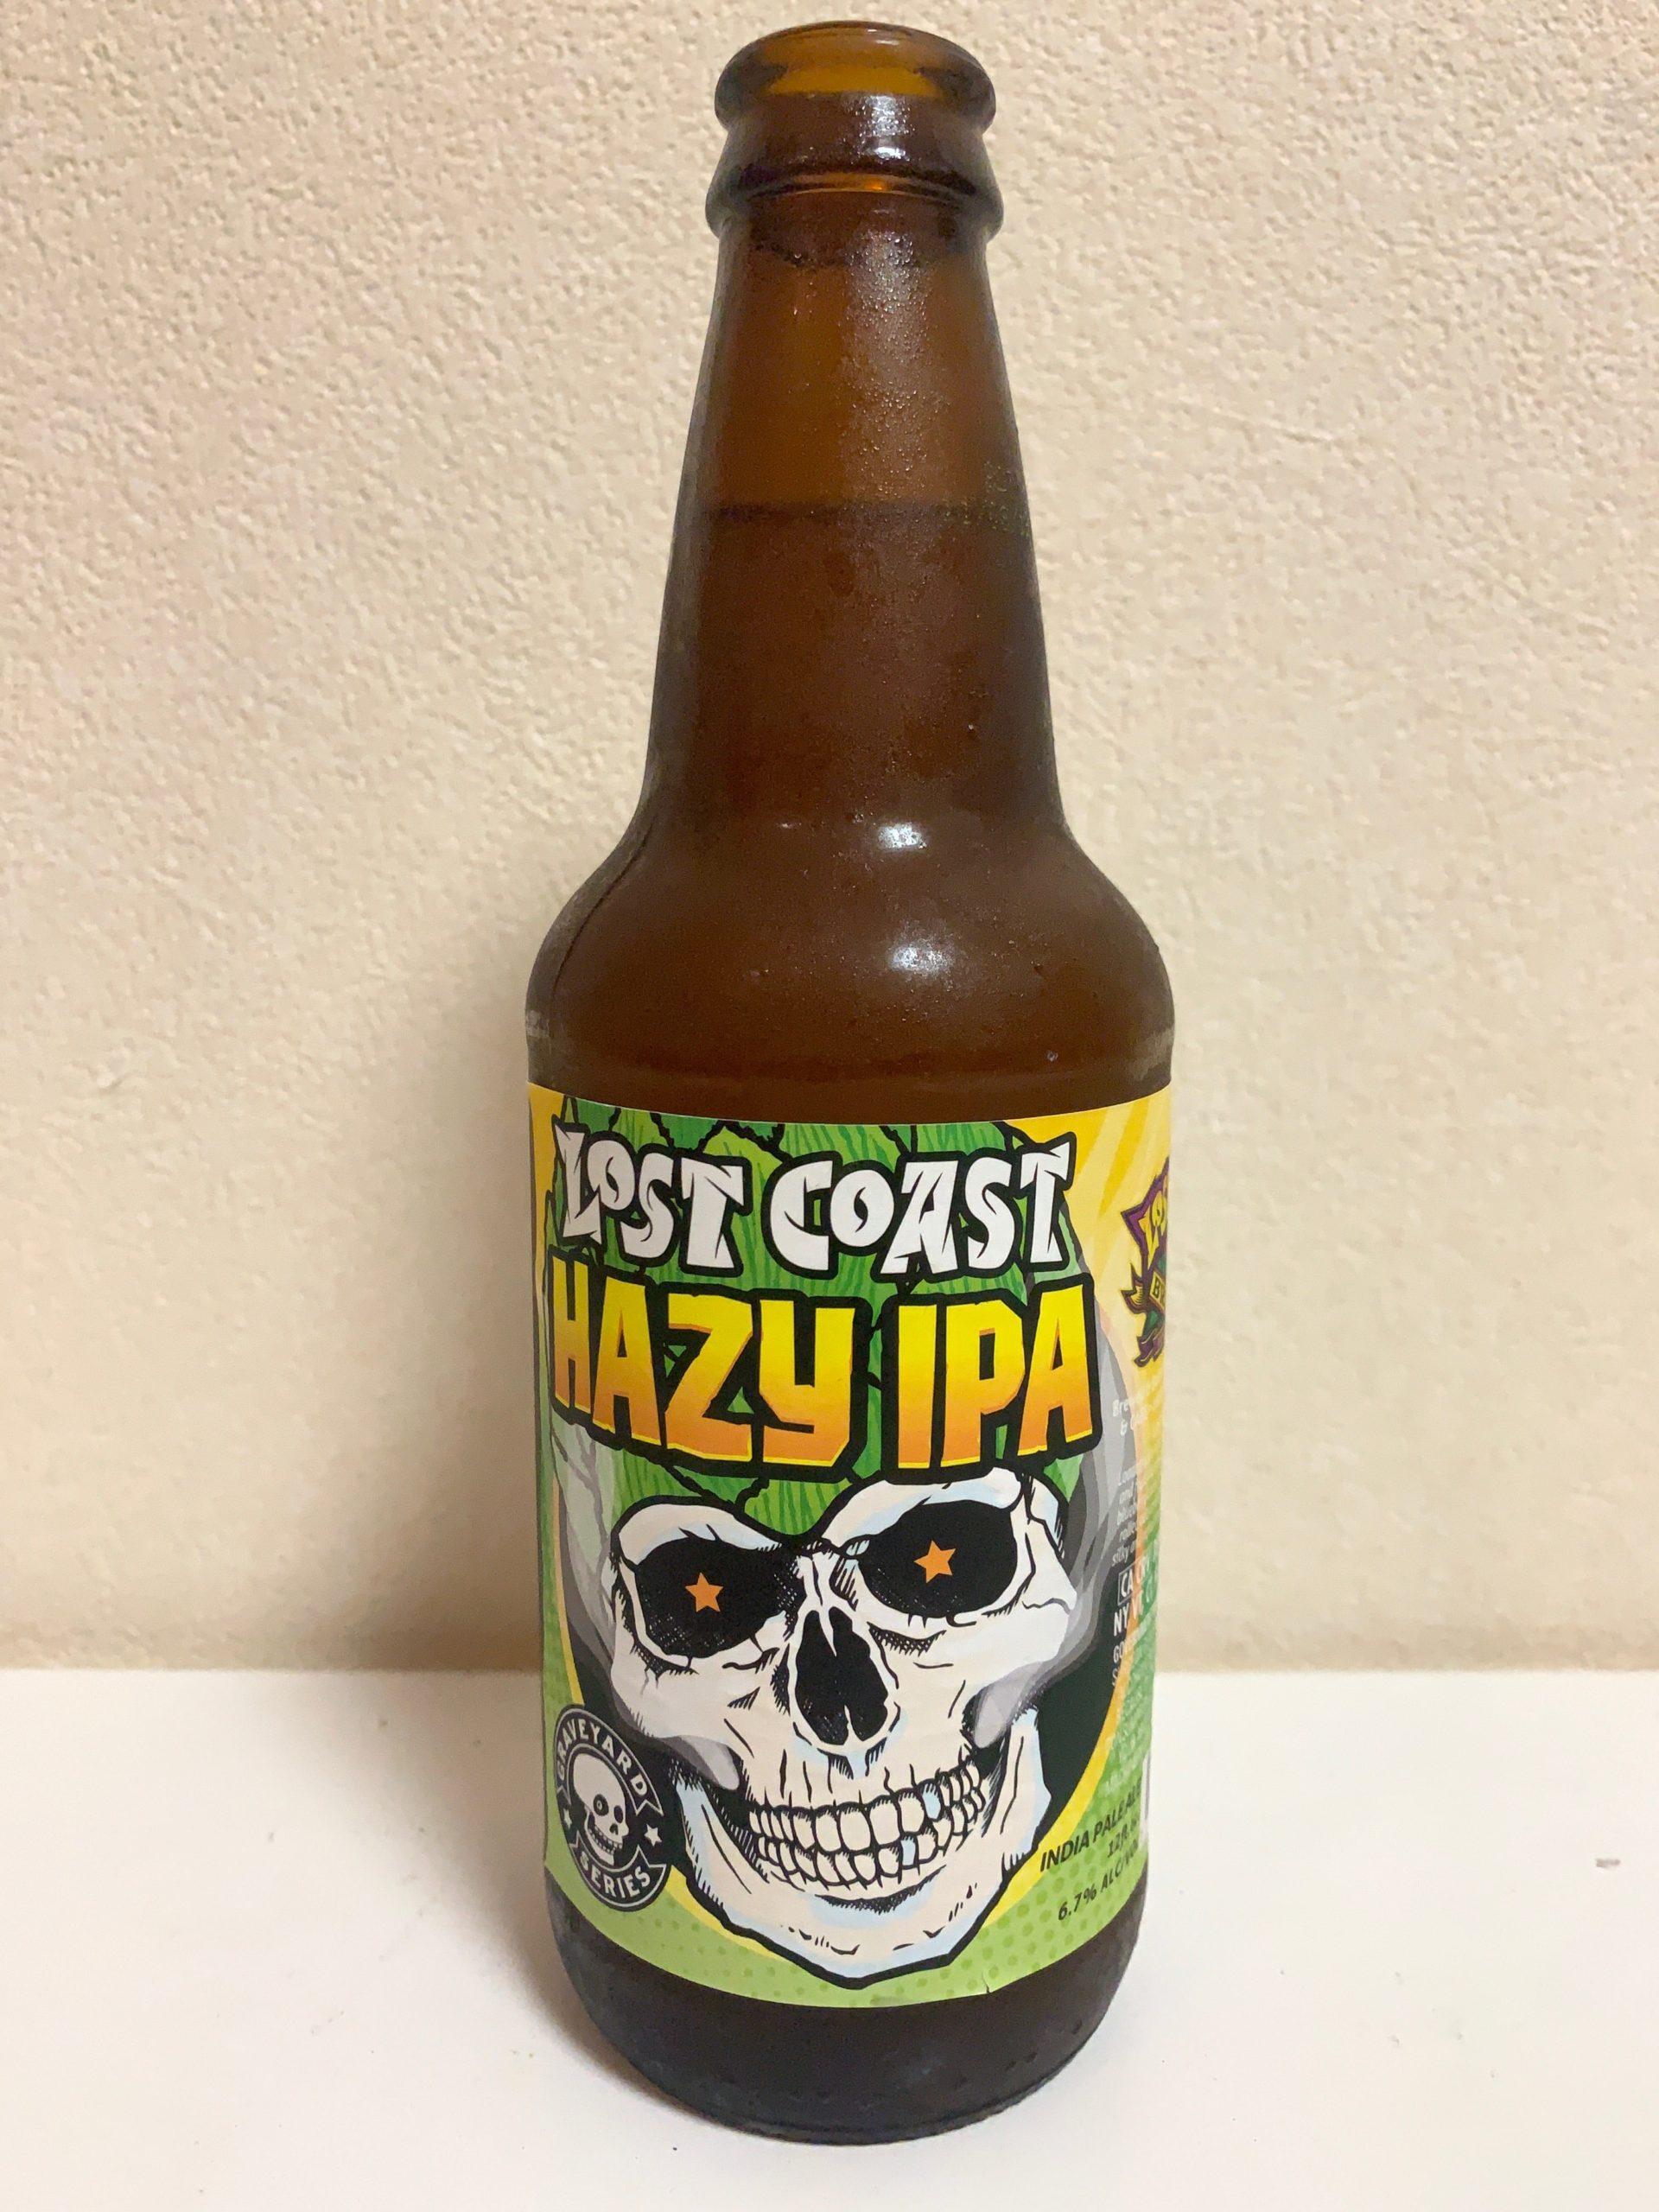 LOST COAST HAZY IPA(ロストコースト ヘイジーIPA)